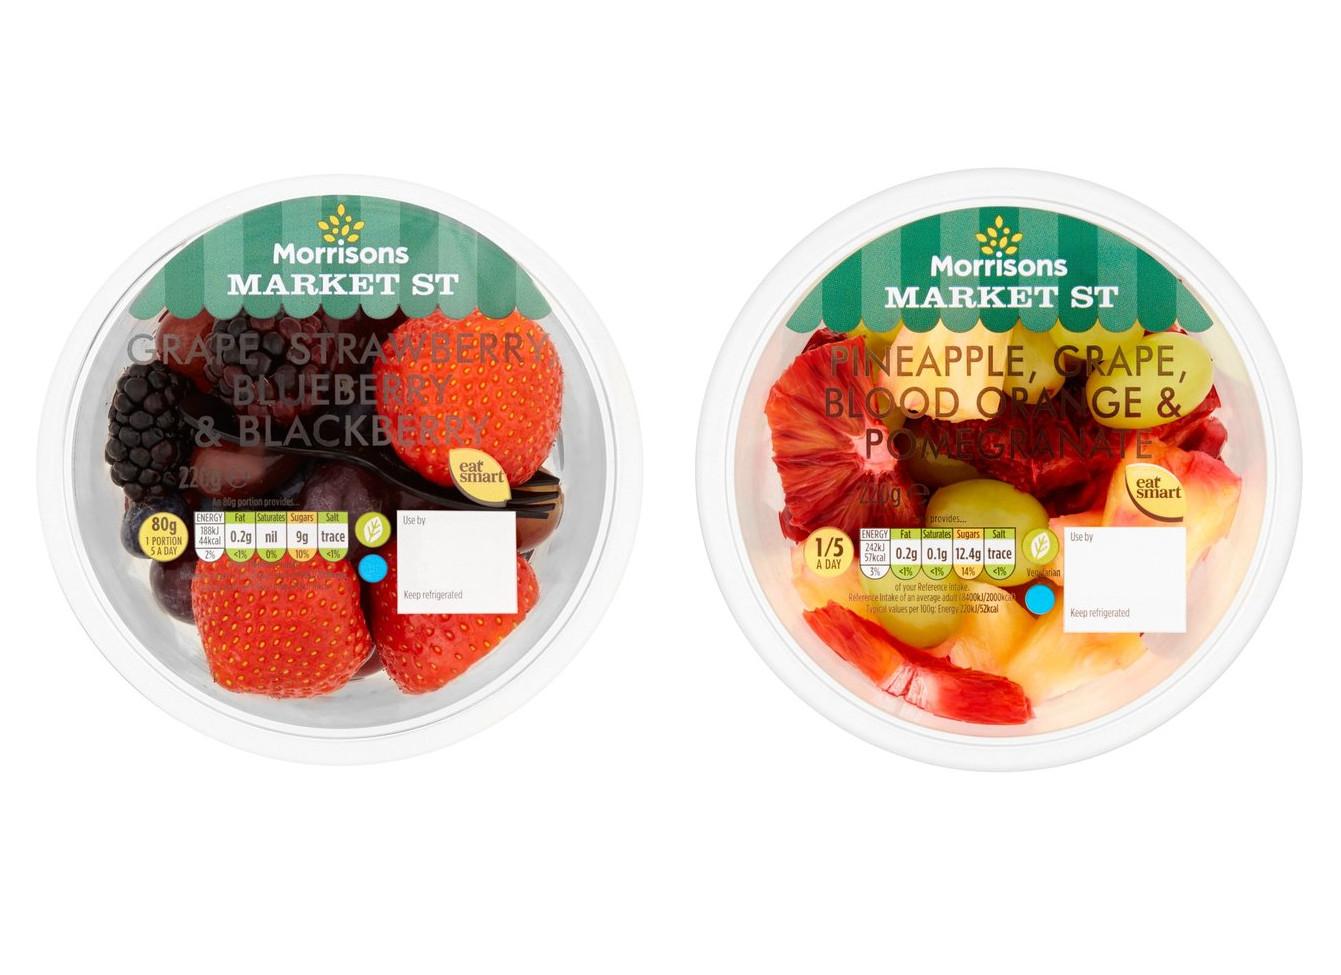 Blood Orange Pomegranate Grape & Pineapple / Grape, Strawberry & Blackberry 220g only 50p @ Morrisons